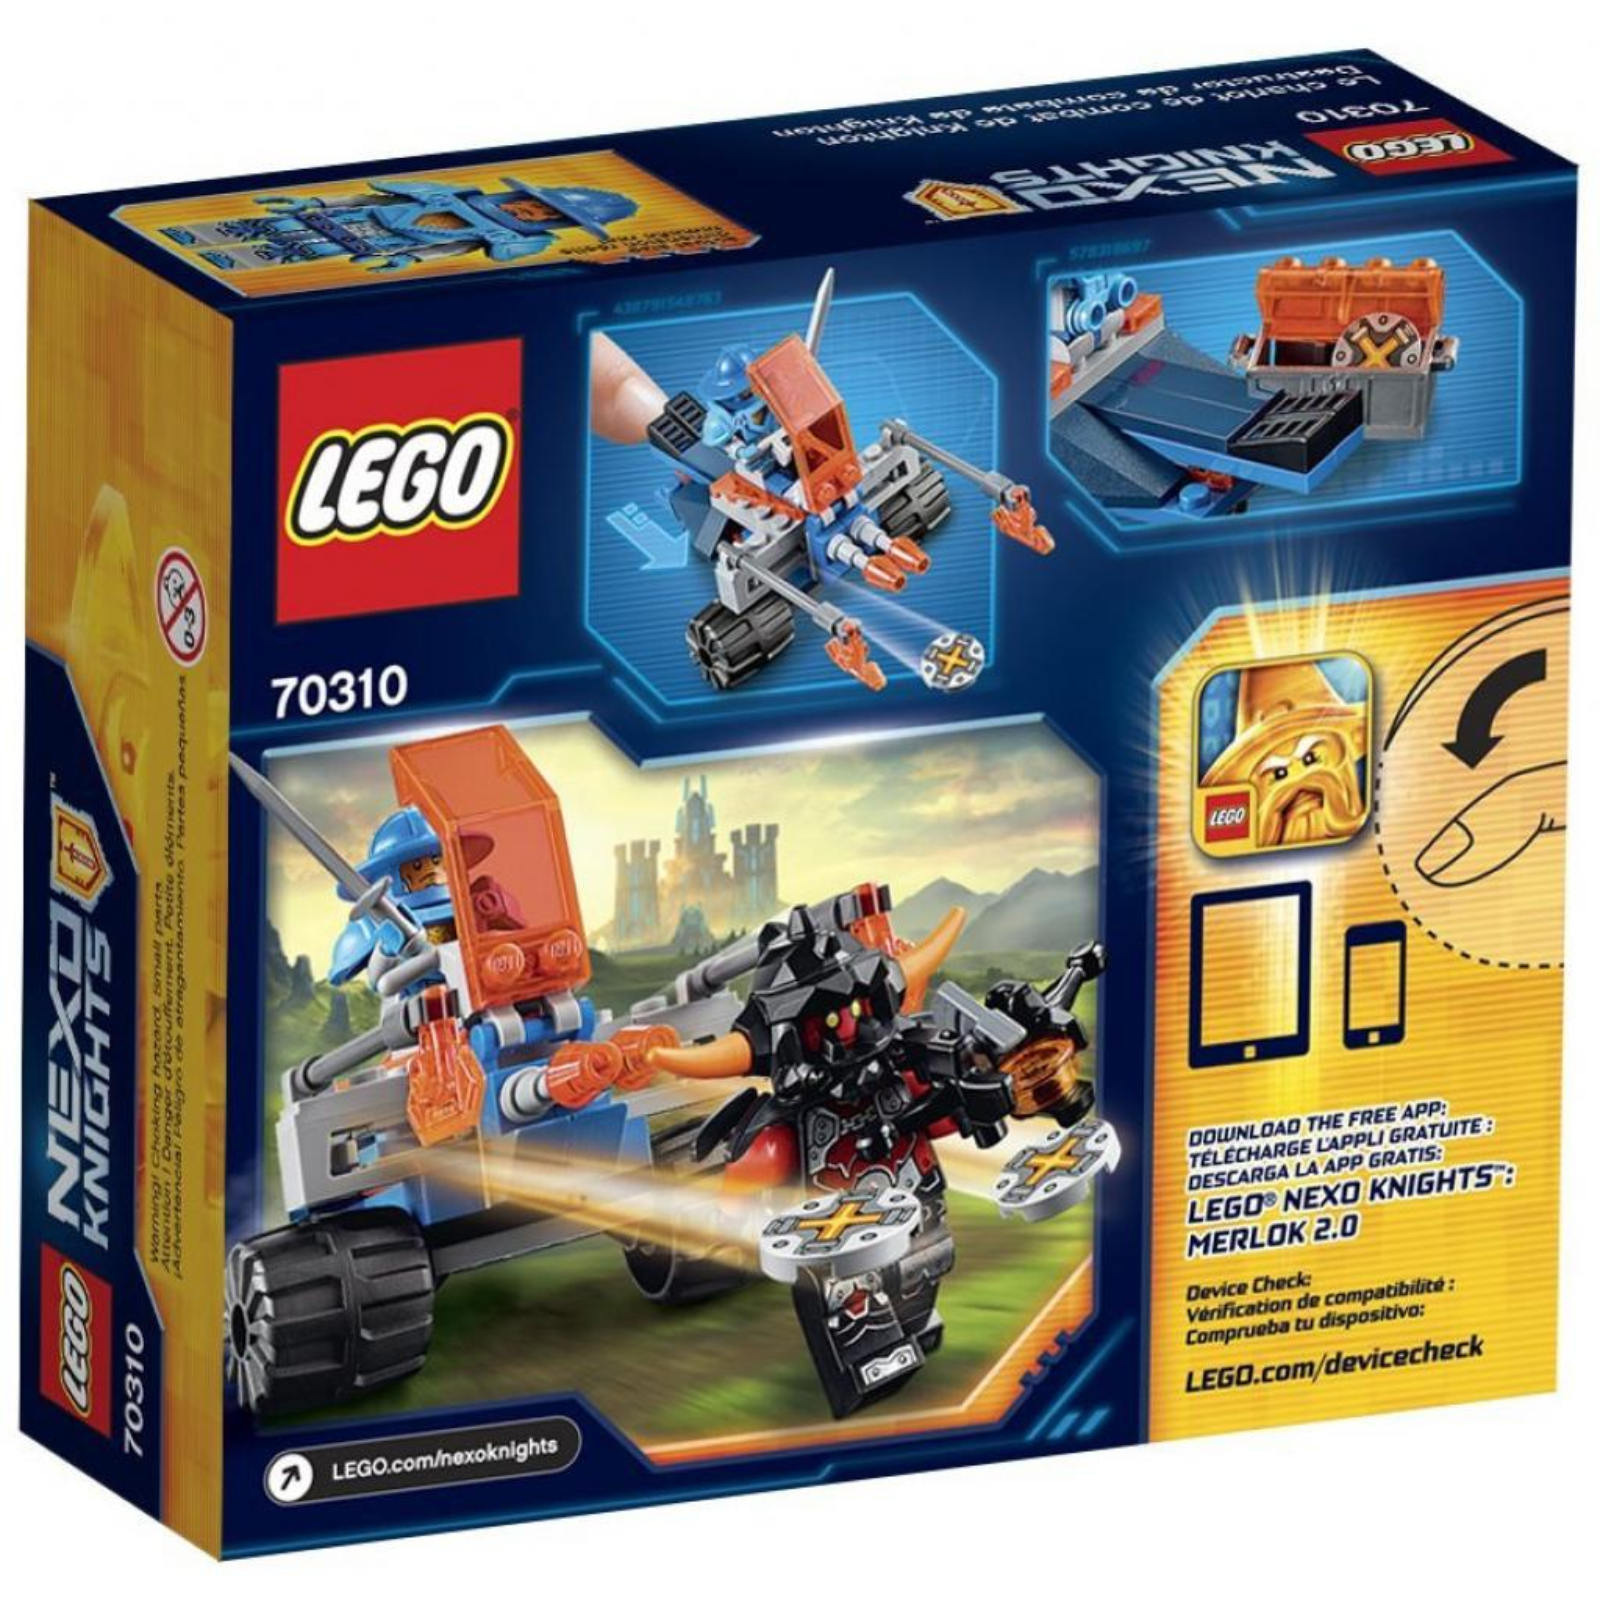 Конструктор LEGO Nexo Knights Королевский боевой бластер (70310) изображение 9